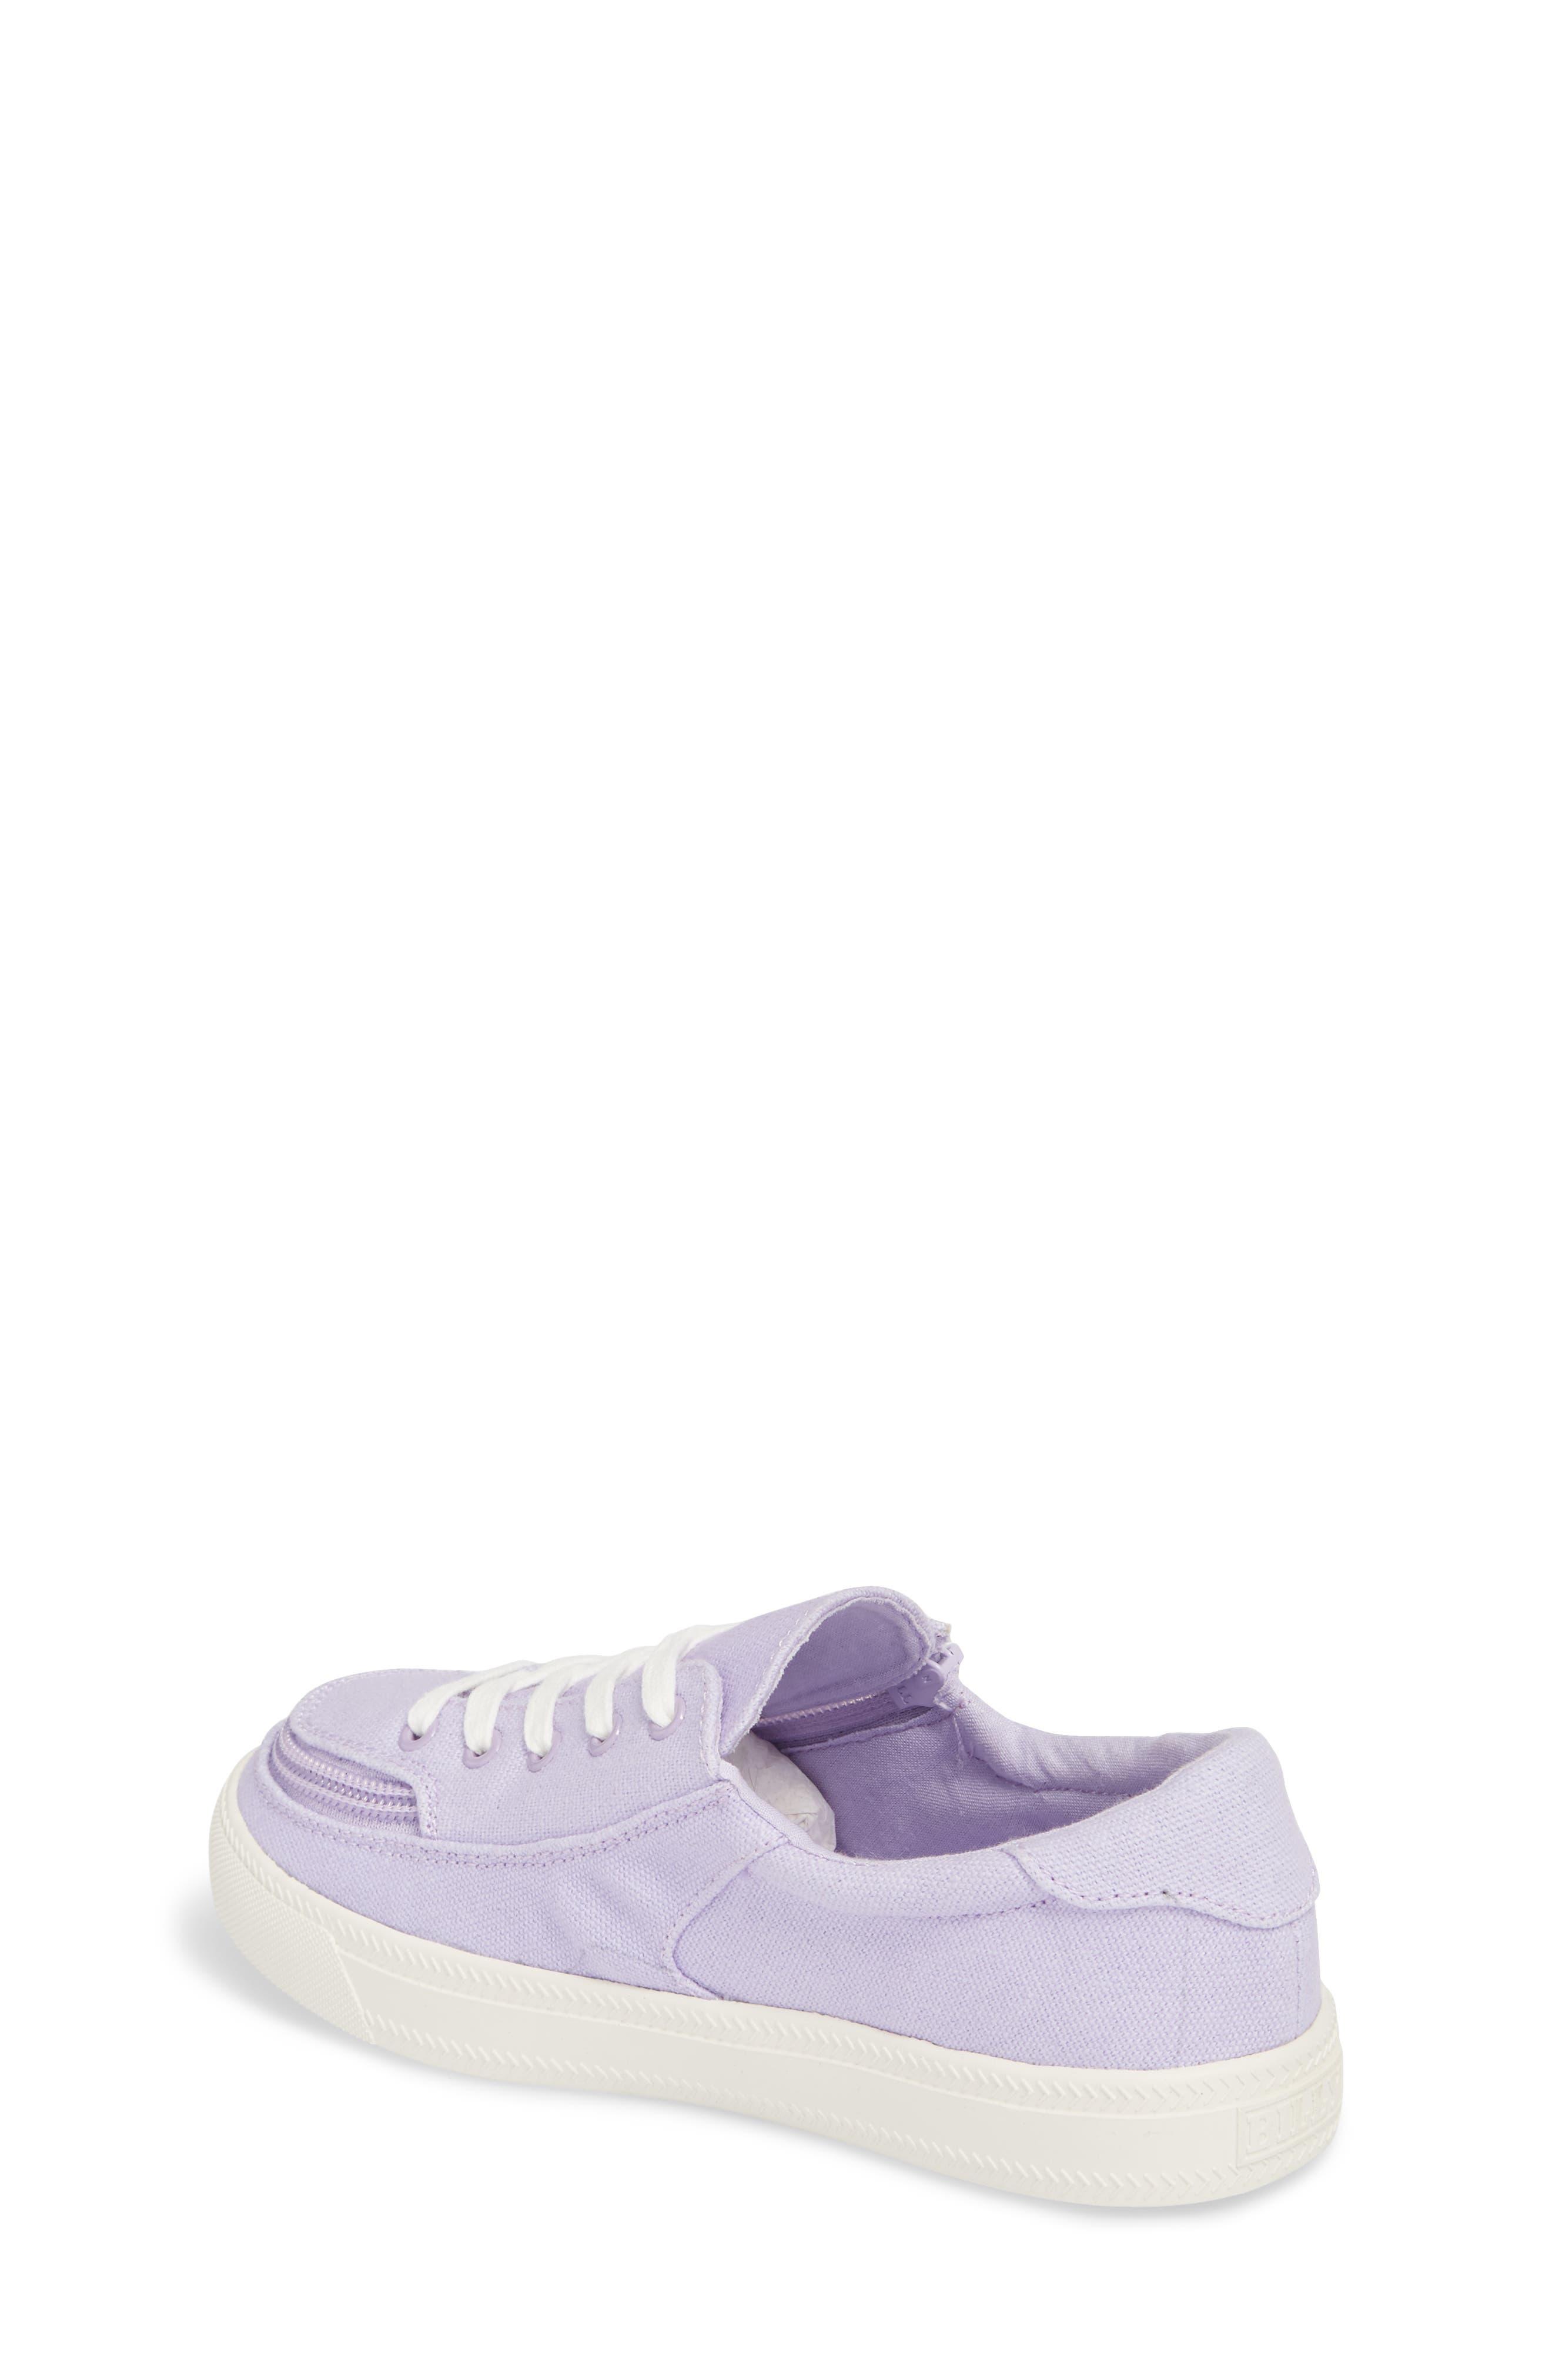 Classic Zip Around Low Top Sneaker,                             Alternate thumbnail 2, color,                             Lavender